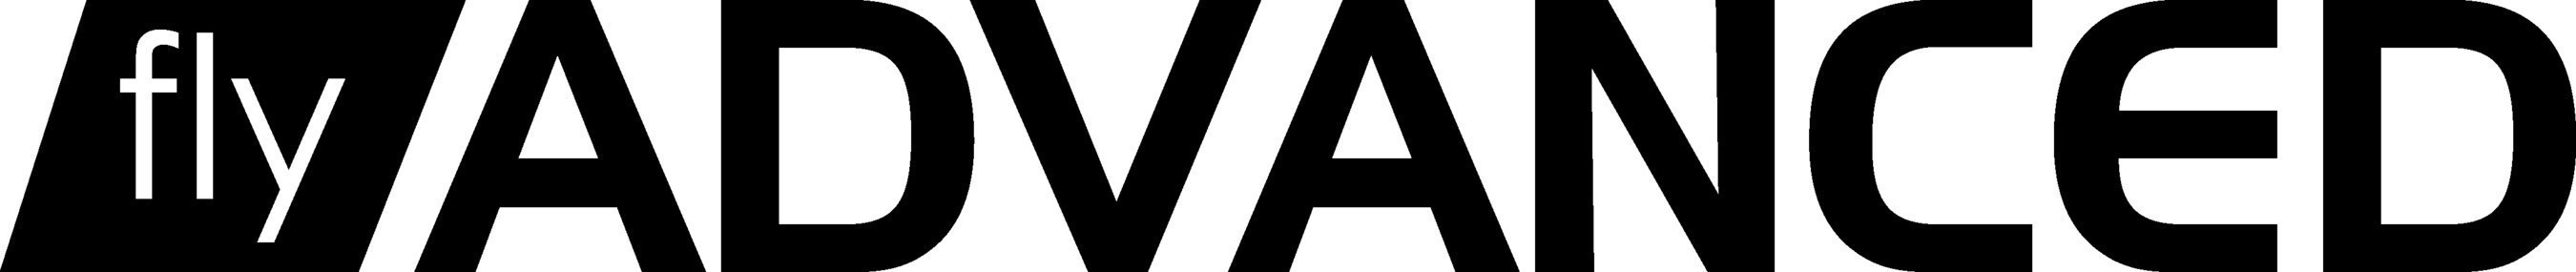 flyADVANCED logo